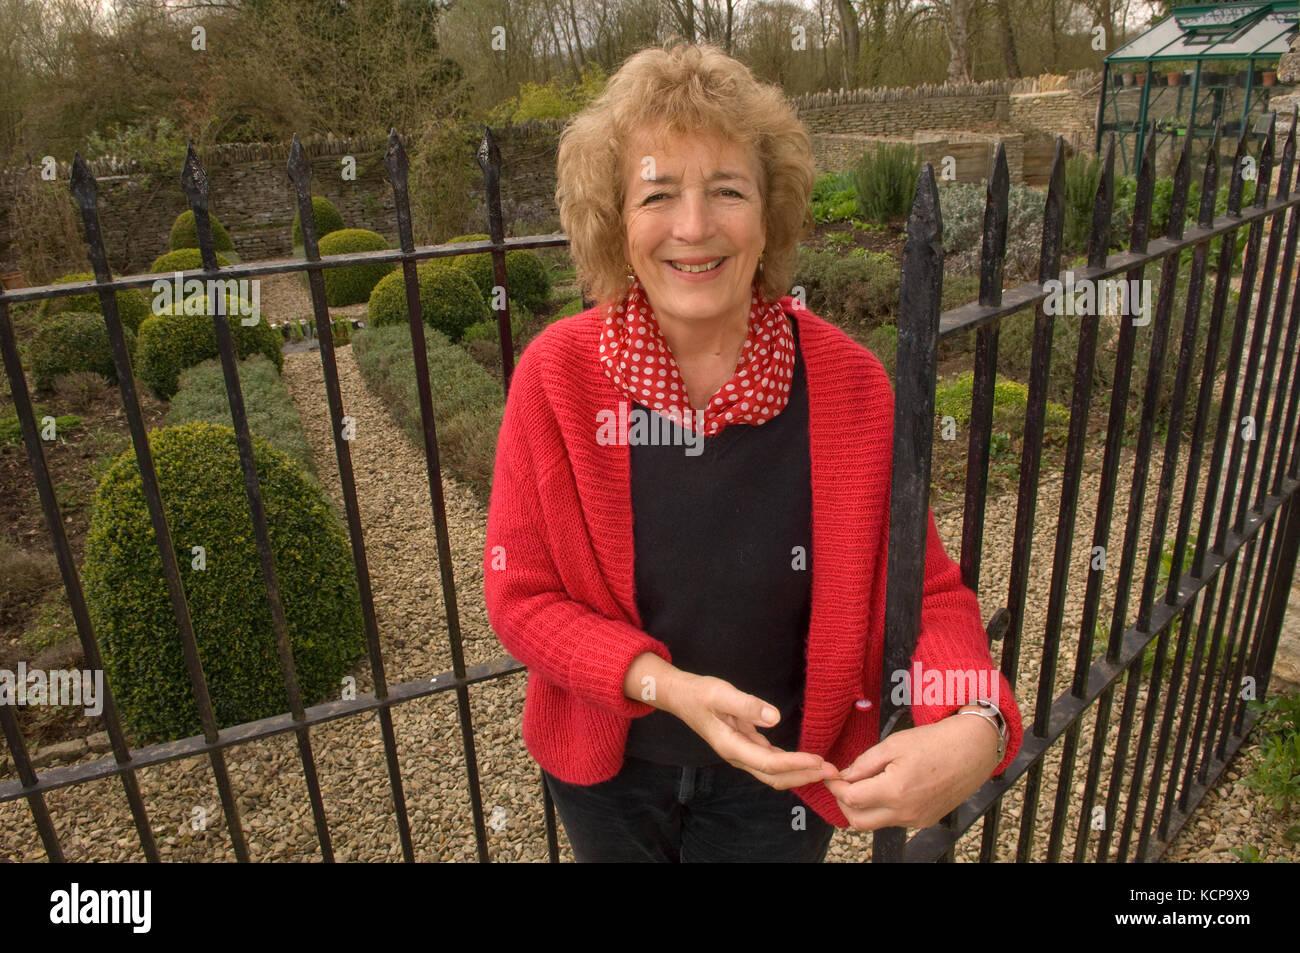 Gardener, author, broadcaster Judith Hann in her herb garden. Stock Photo